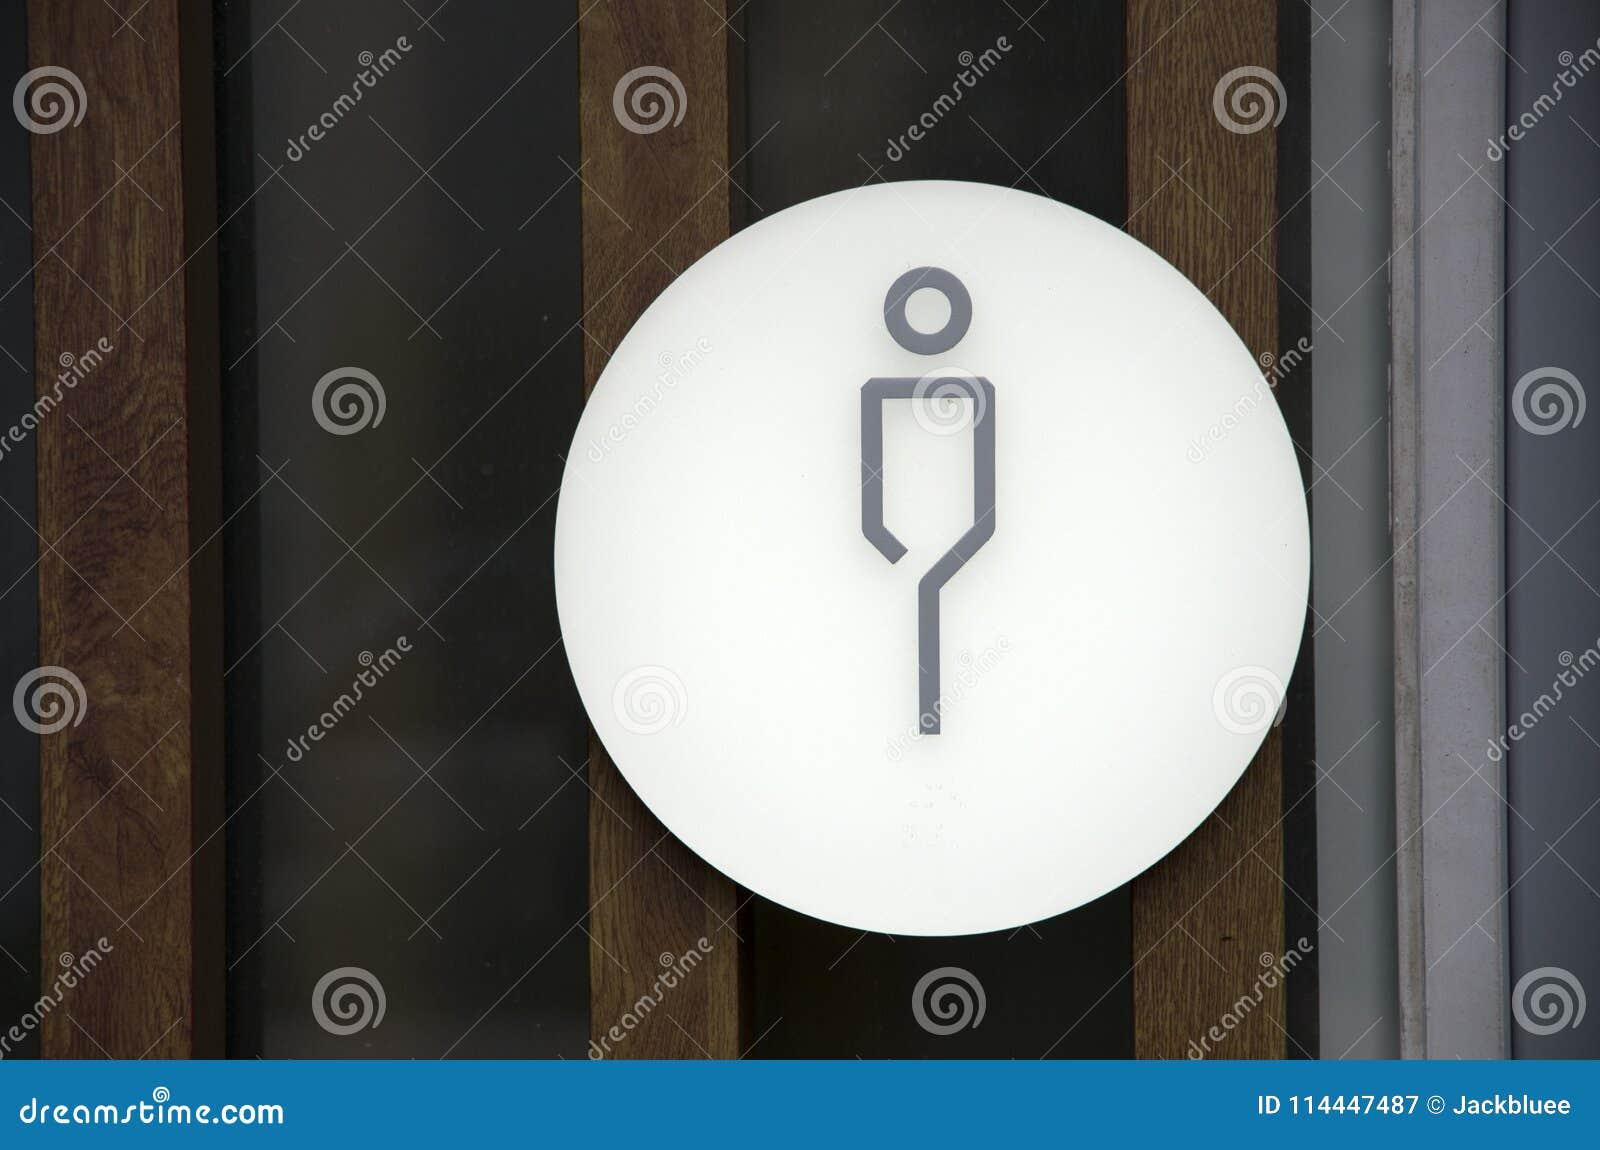 Man Bathroom Sign Toilet Gentleman Stock Image Image Of Bathroom